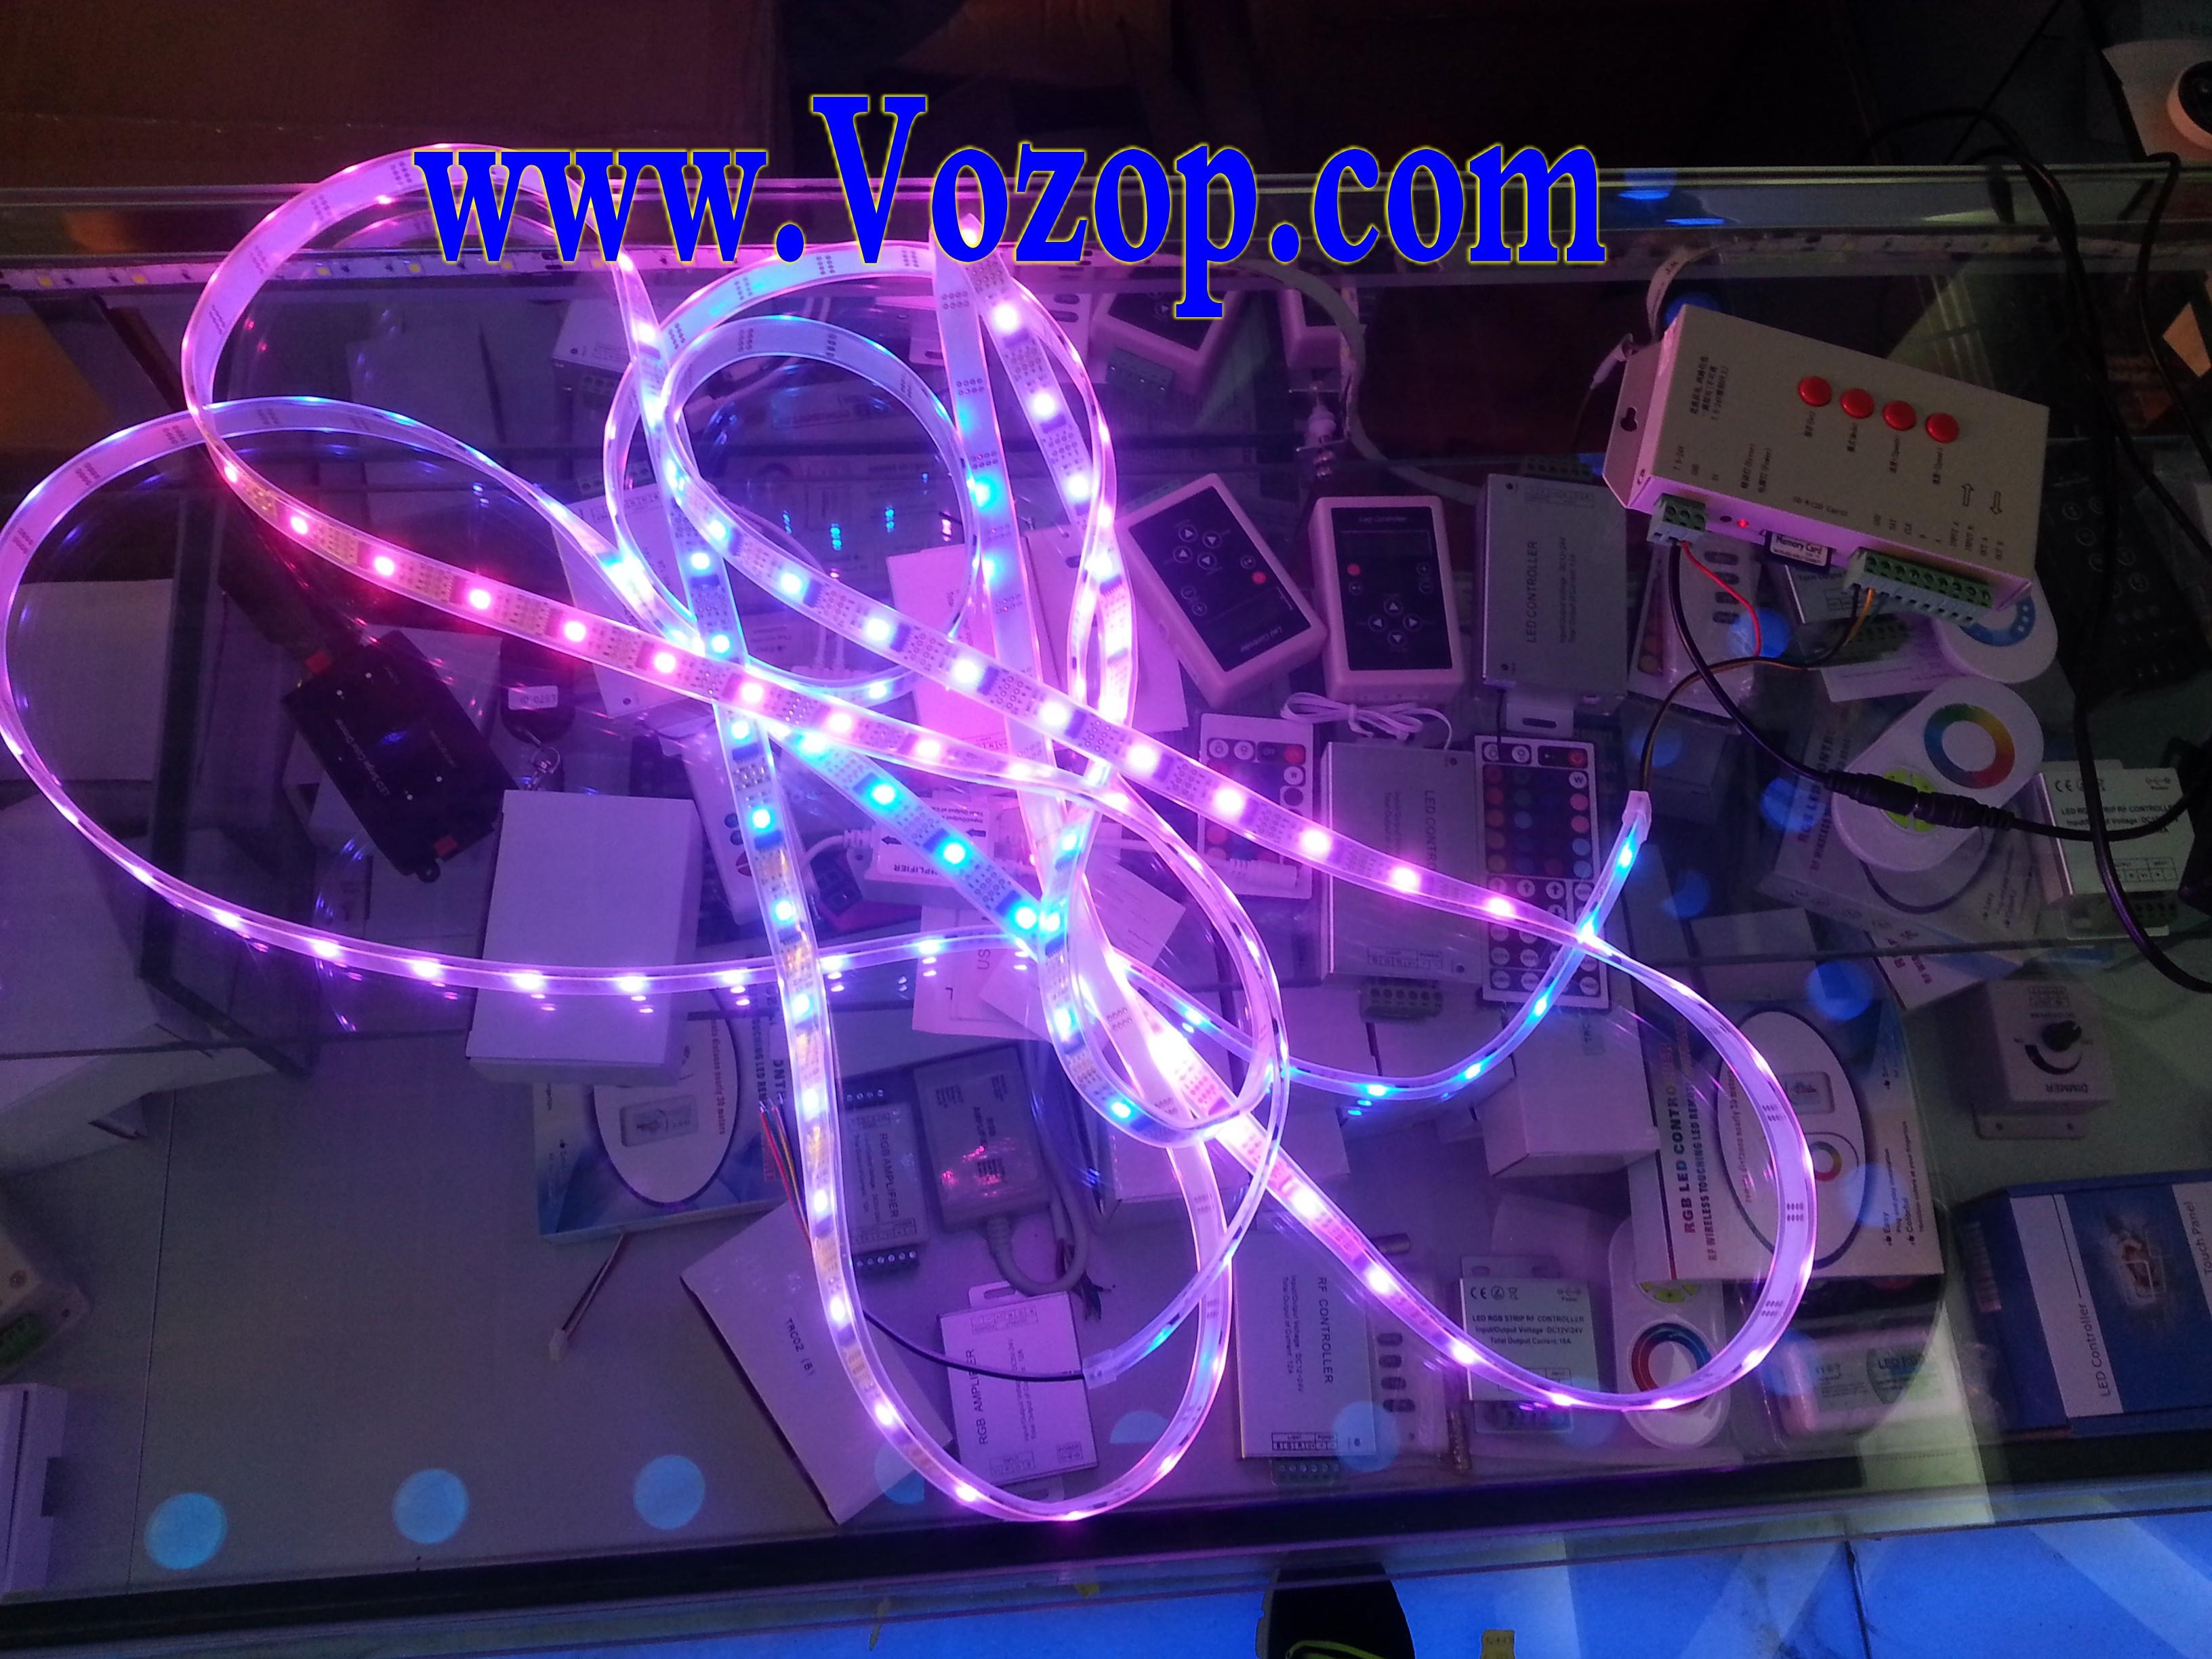 WS2801_Digital_Strip_5_Meters_16.4_Feet_DC_5V_Smart_LED_Tape_Ribbon_Rope_Lights_connection